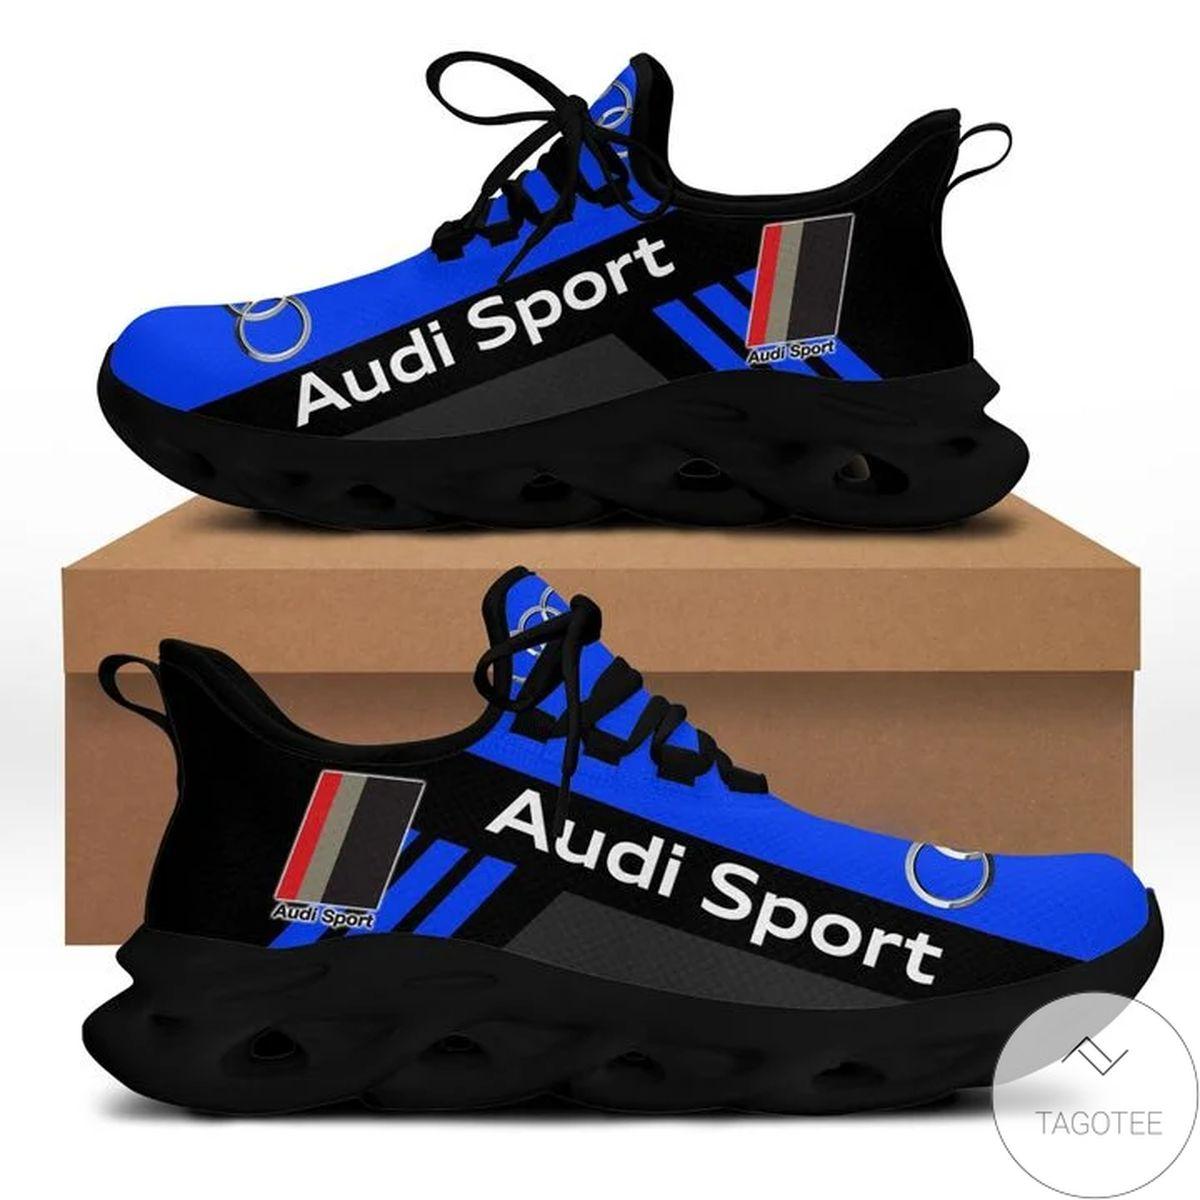 Audi Sport Yeezy Running Sneaker Max Soul Shoes